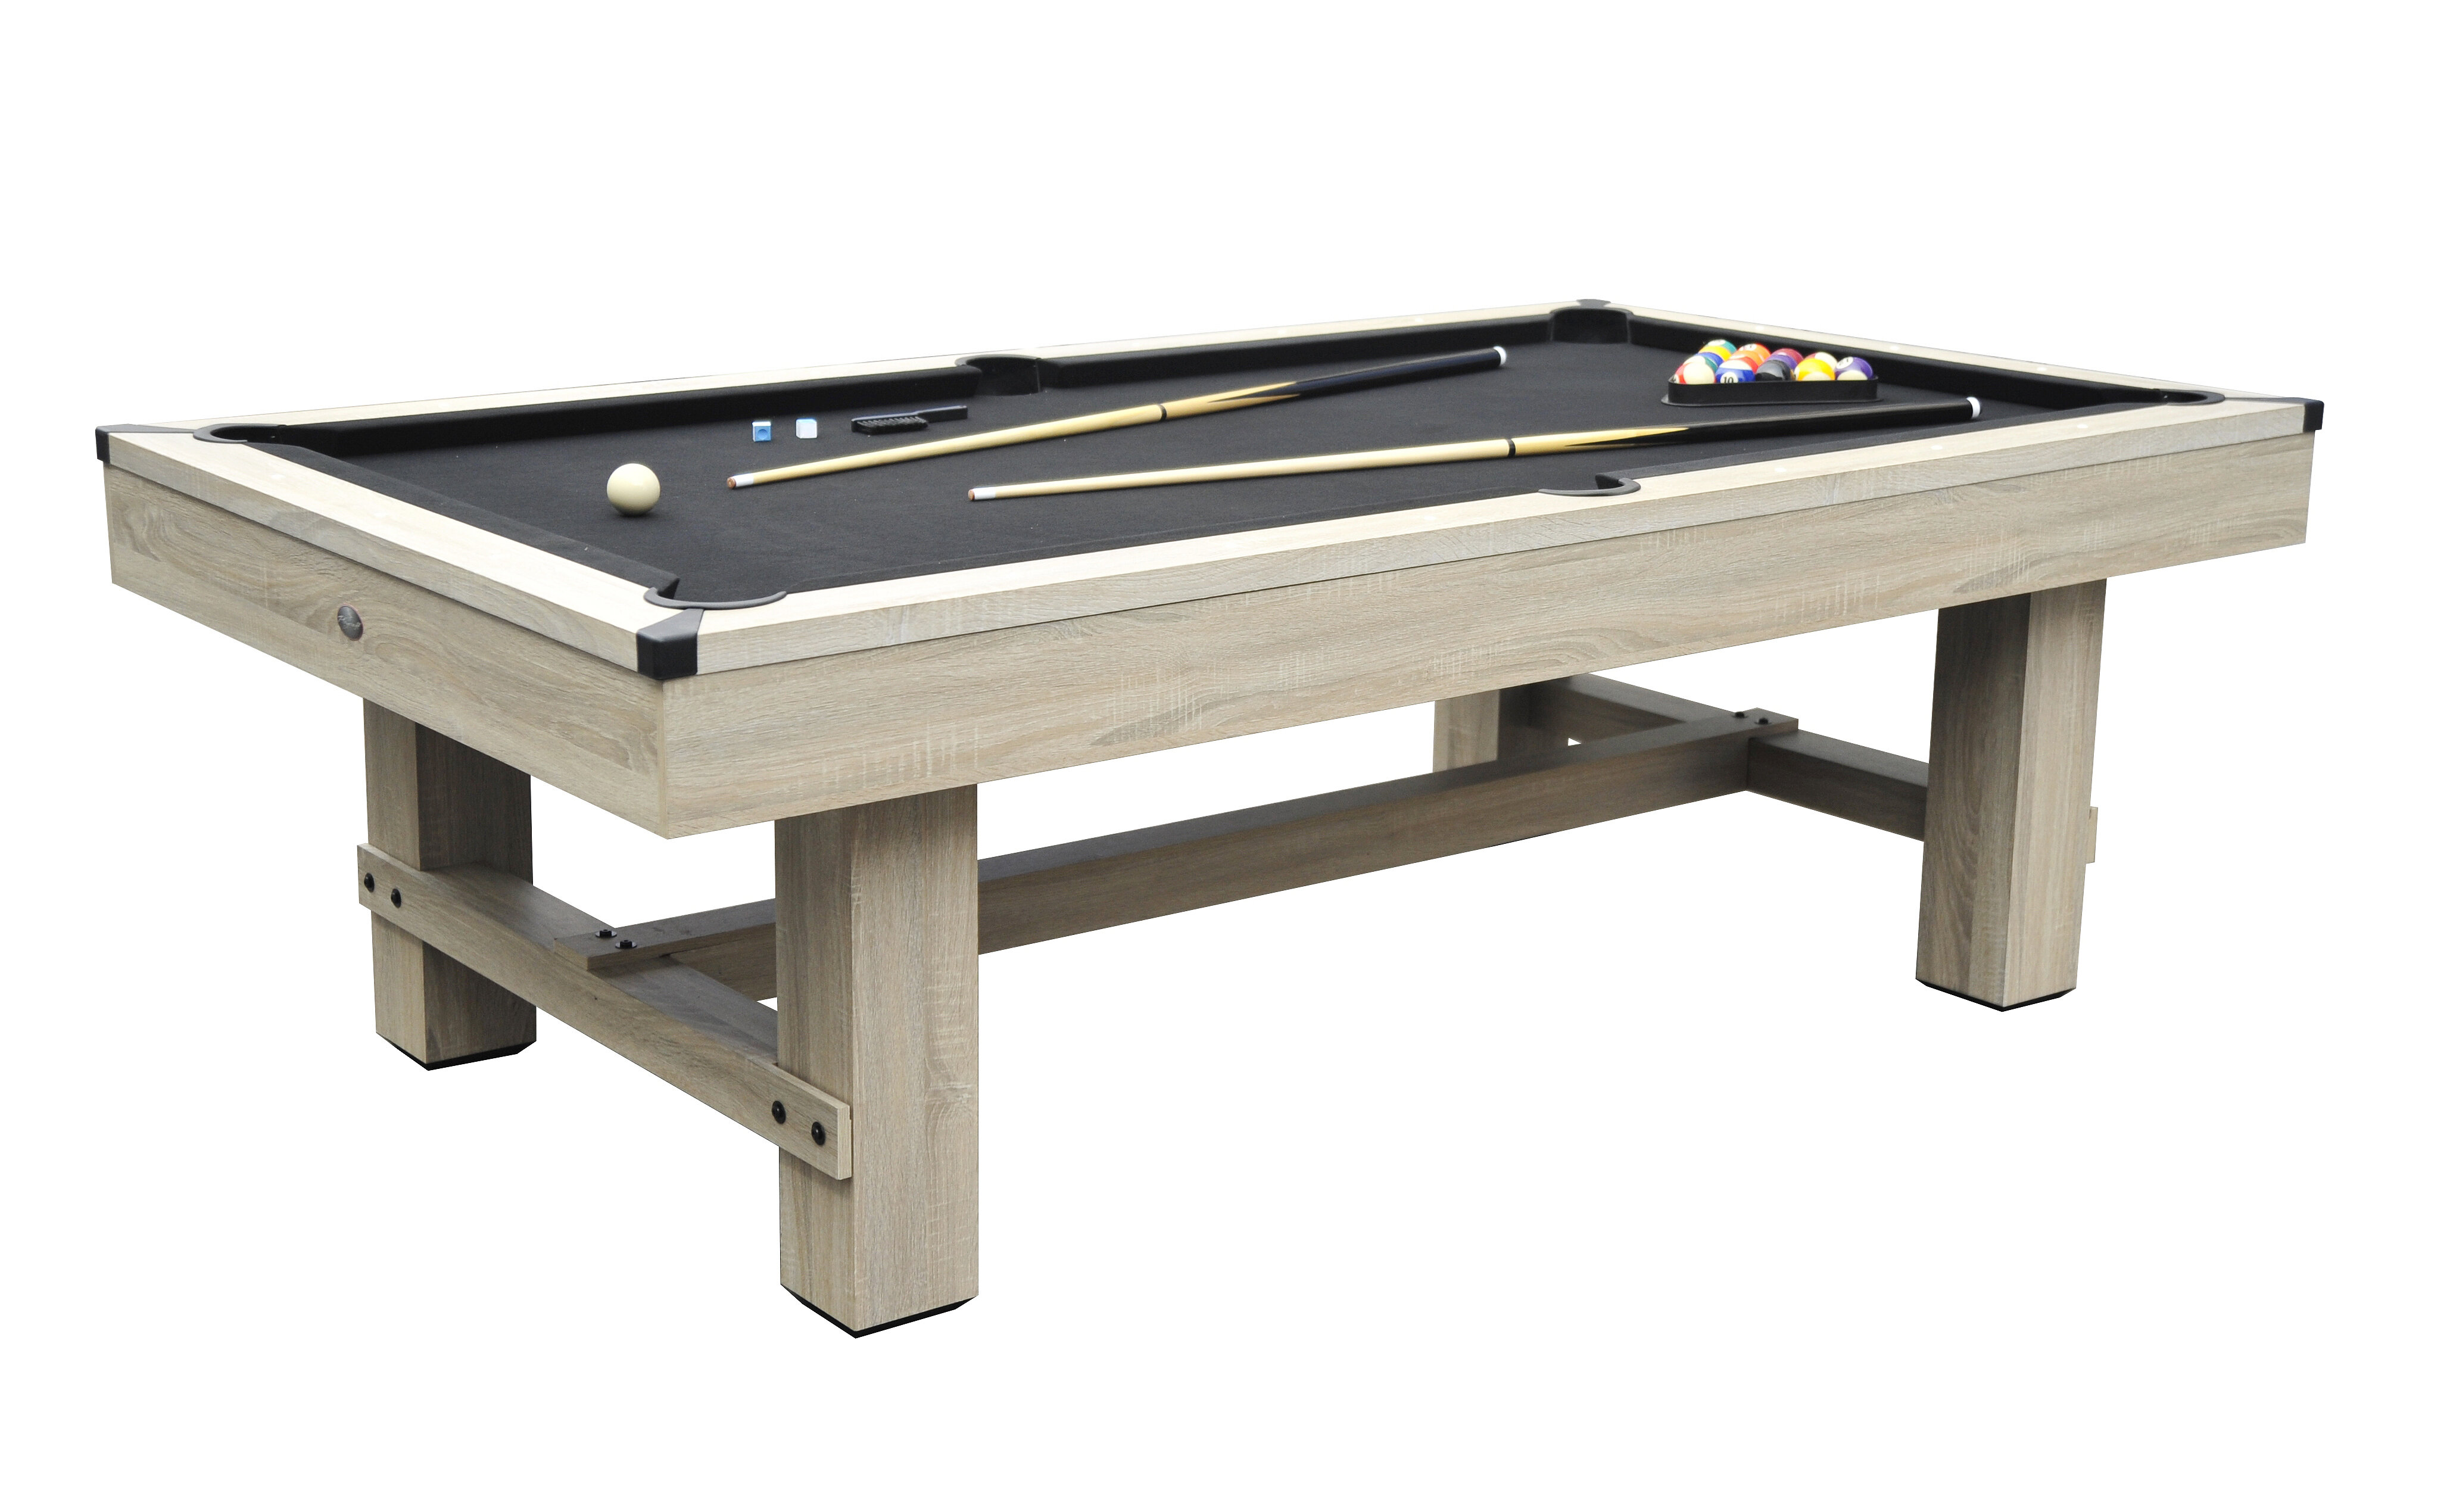 Playcraft Bryce Pool Table Reviews Wayfair - Pool table equipment near me